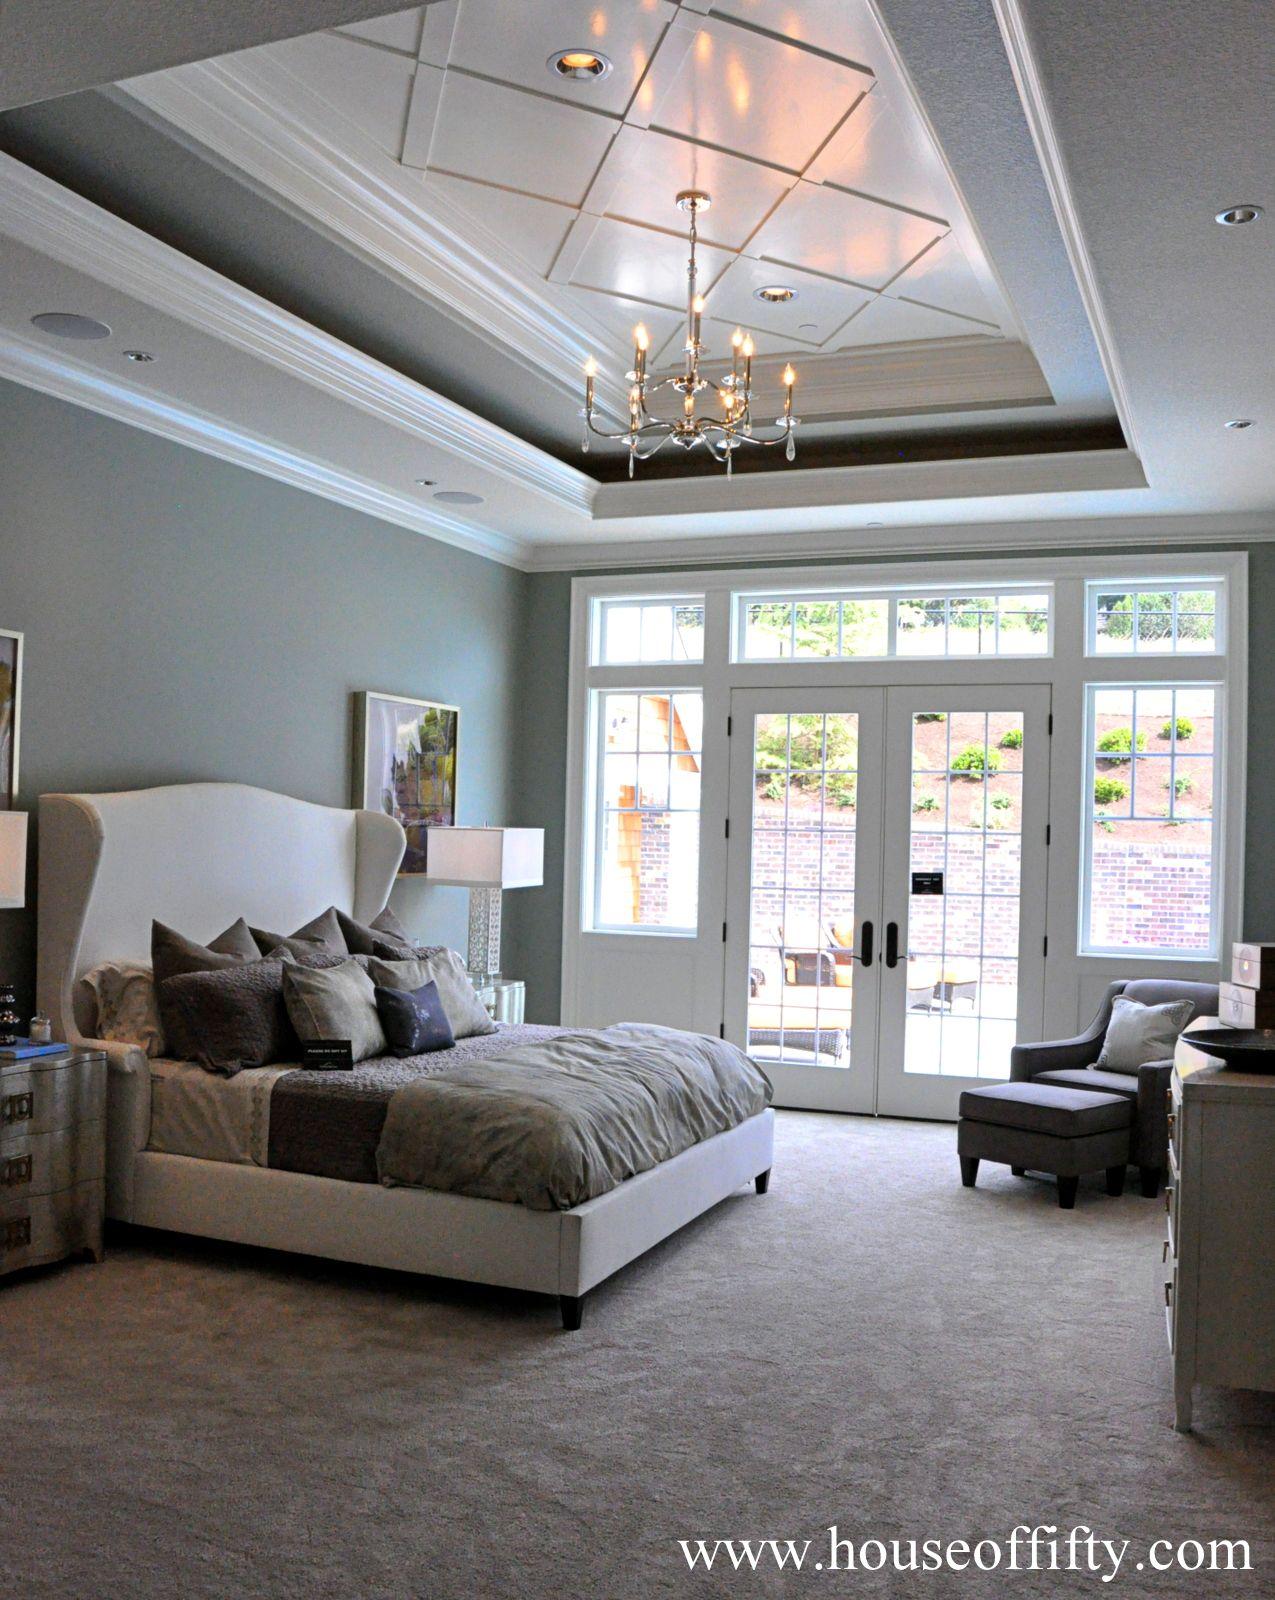 Master bedroom bedroom ceiling decor  Gray bedroom  Bedroom  Pinterest  Ceiling House and Bedroom